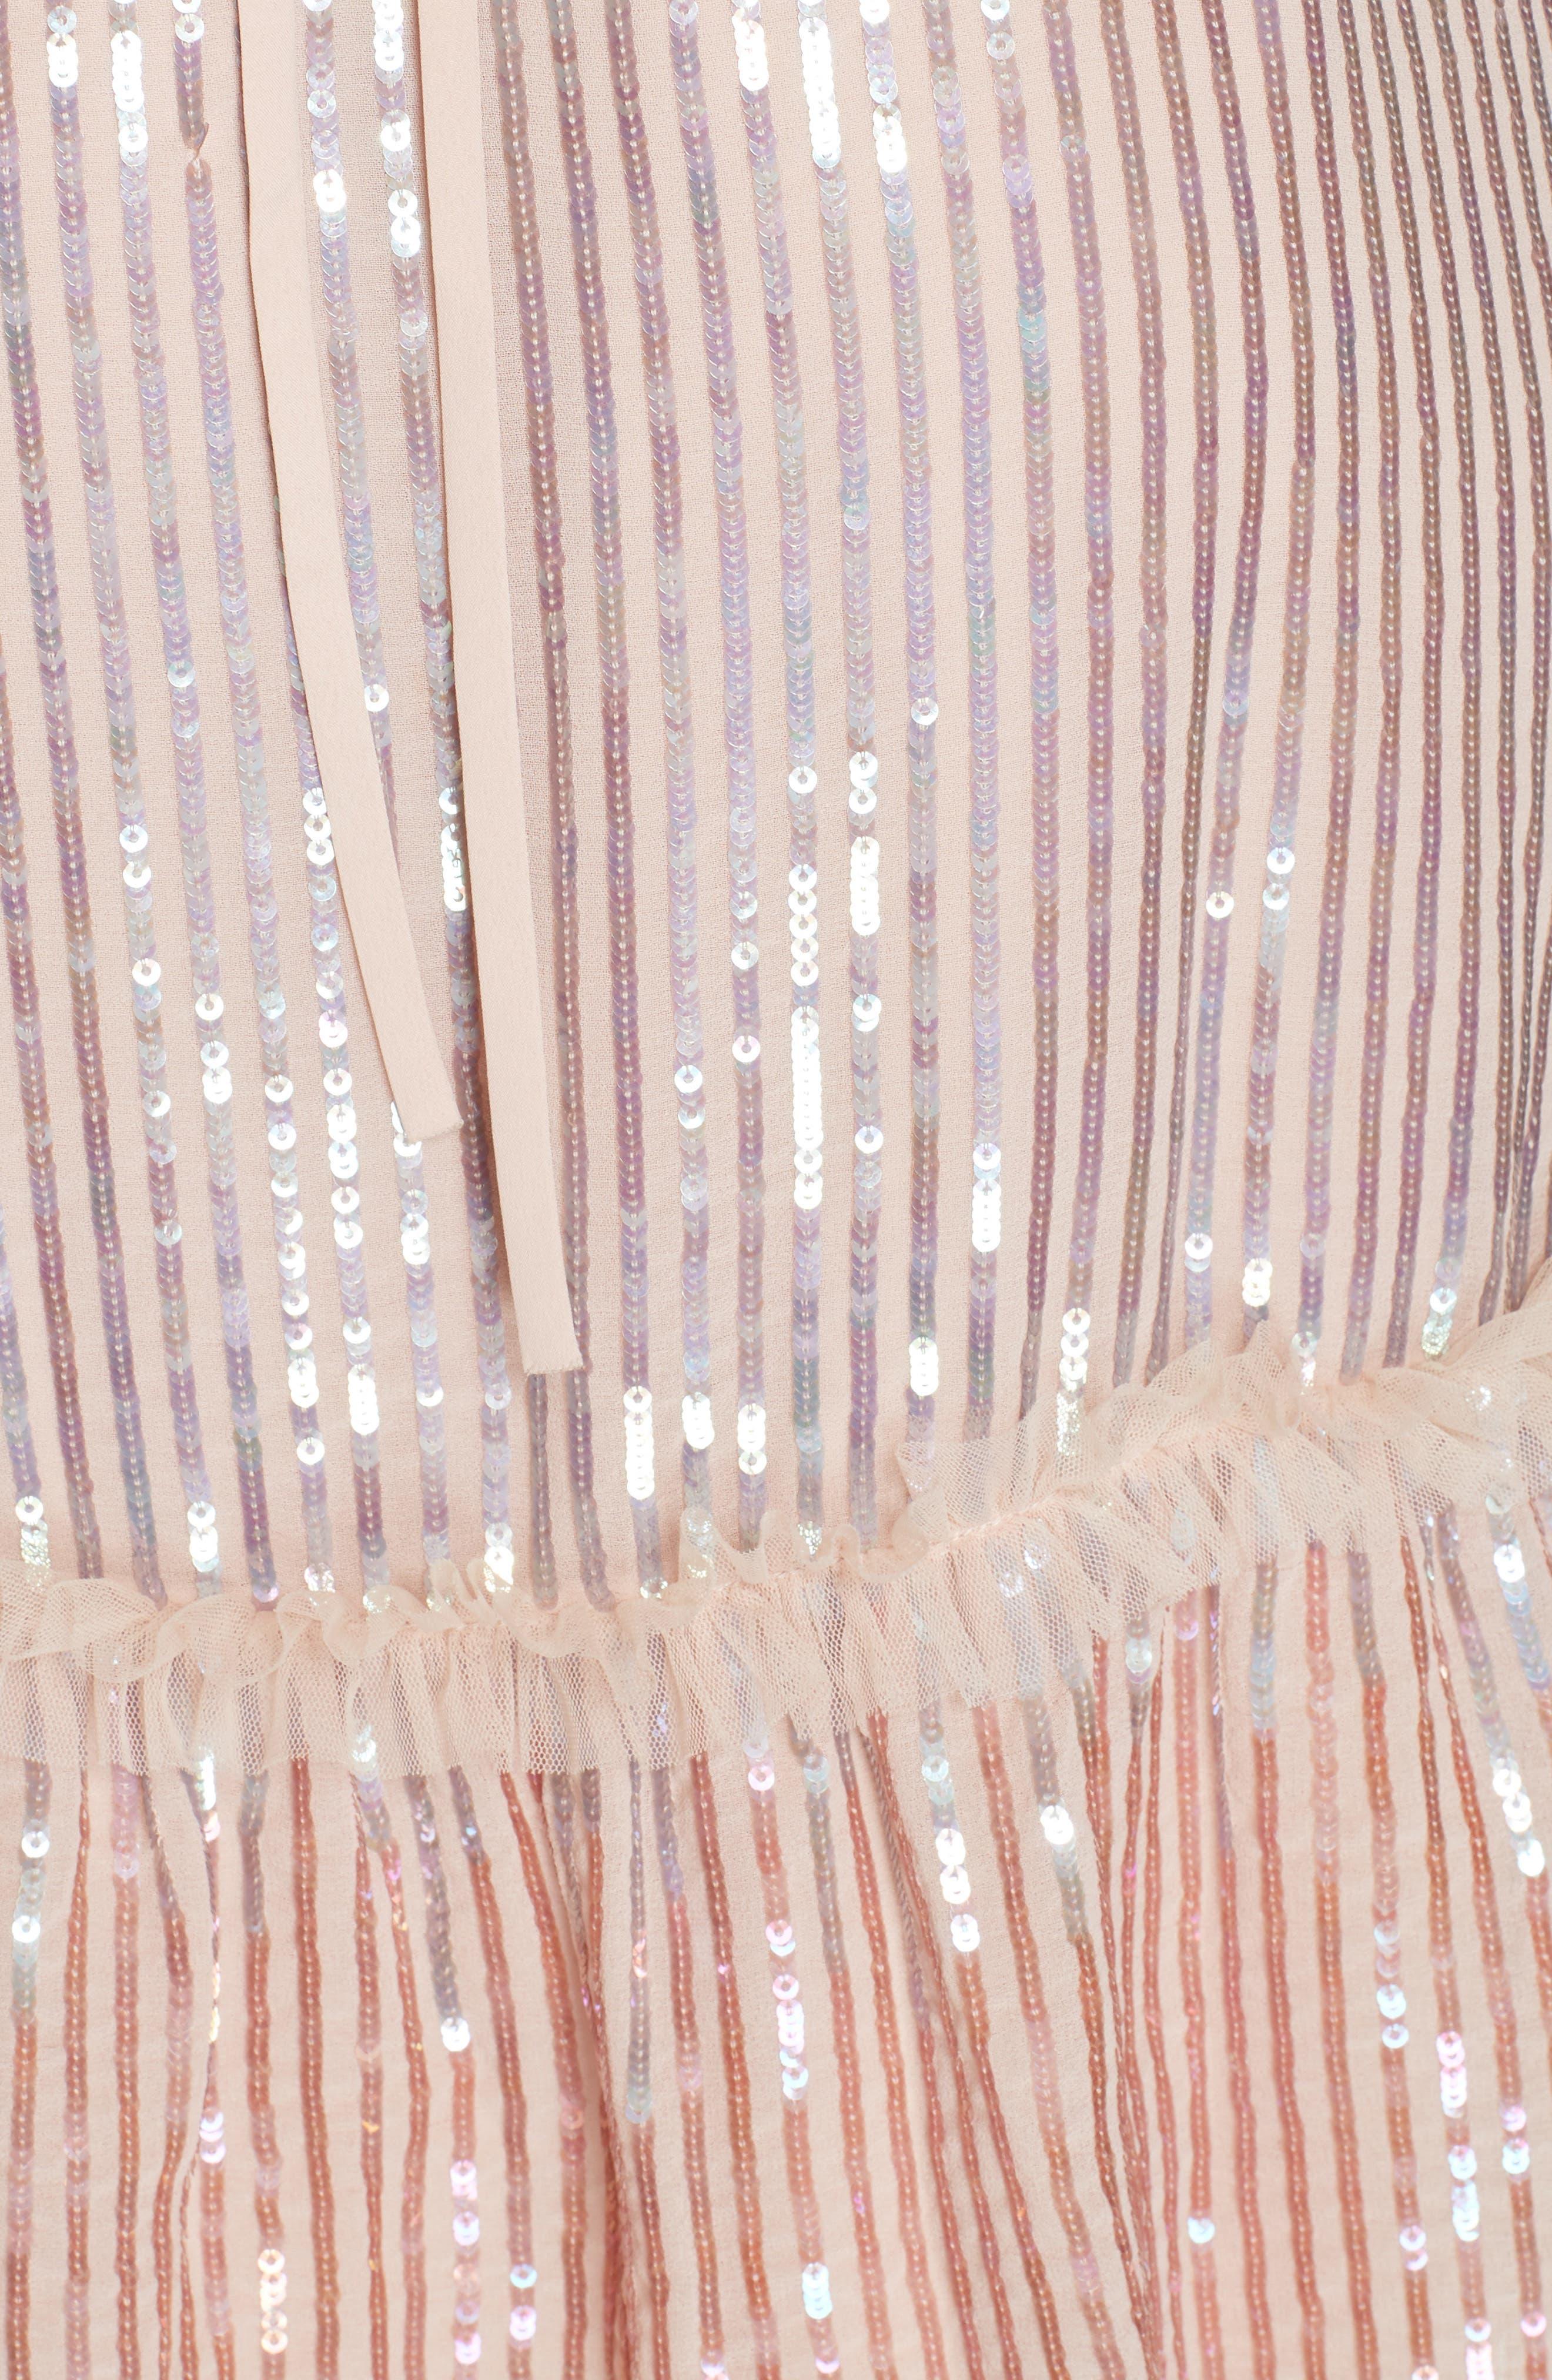 Gloss Sequin Ruffle Dress,                             Alternate thumbnail 6, color,                             DUSK BLUE